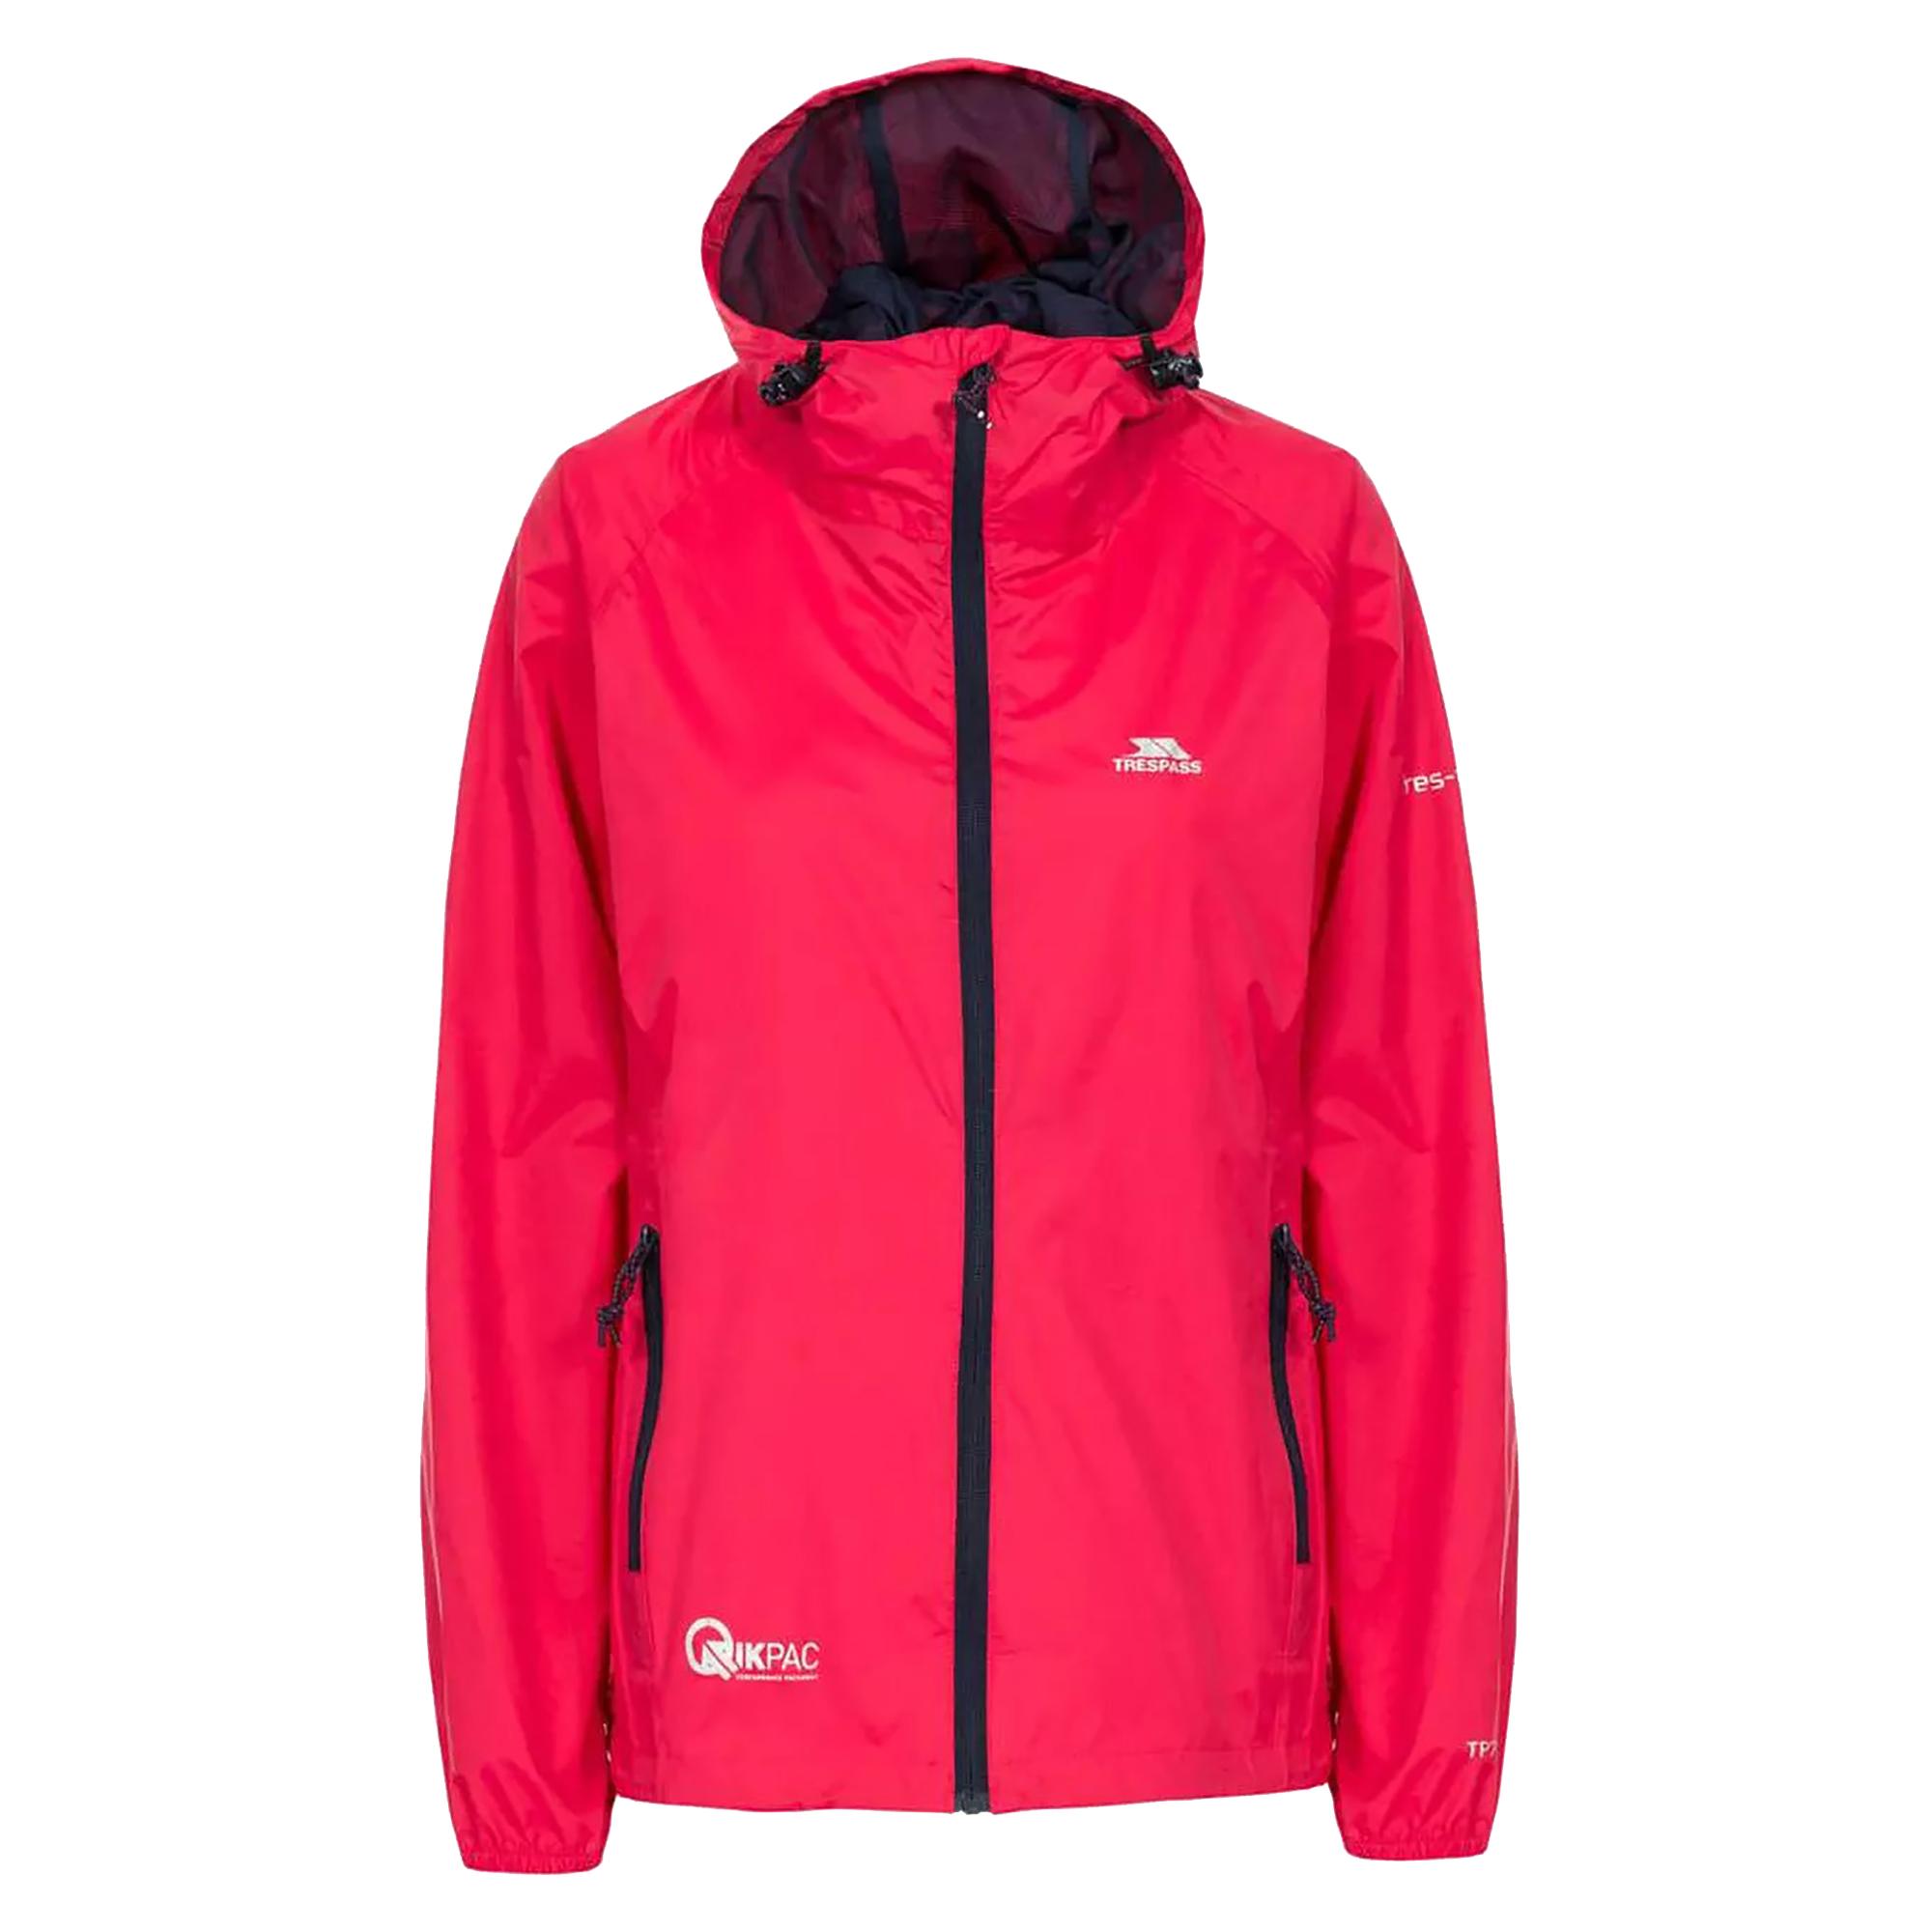 Trespass Womens/Ladies Qikpac Waterproof Packaway Shell Jacket (XXS) (Raspberry)